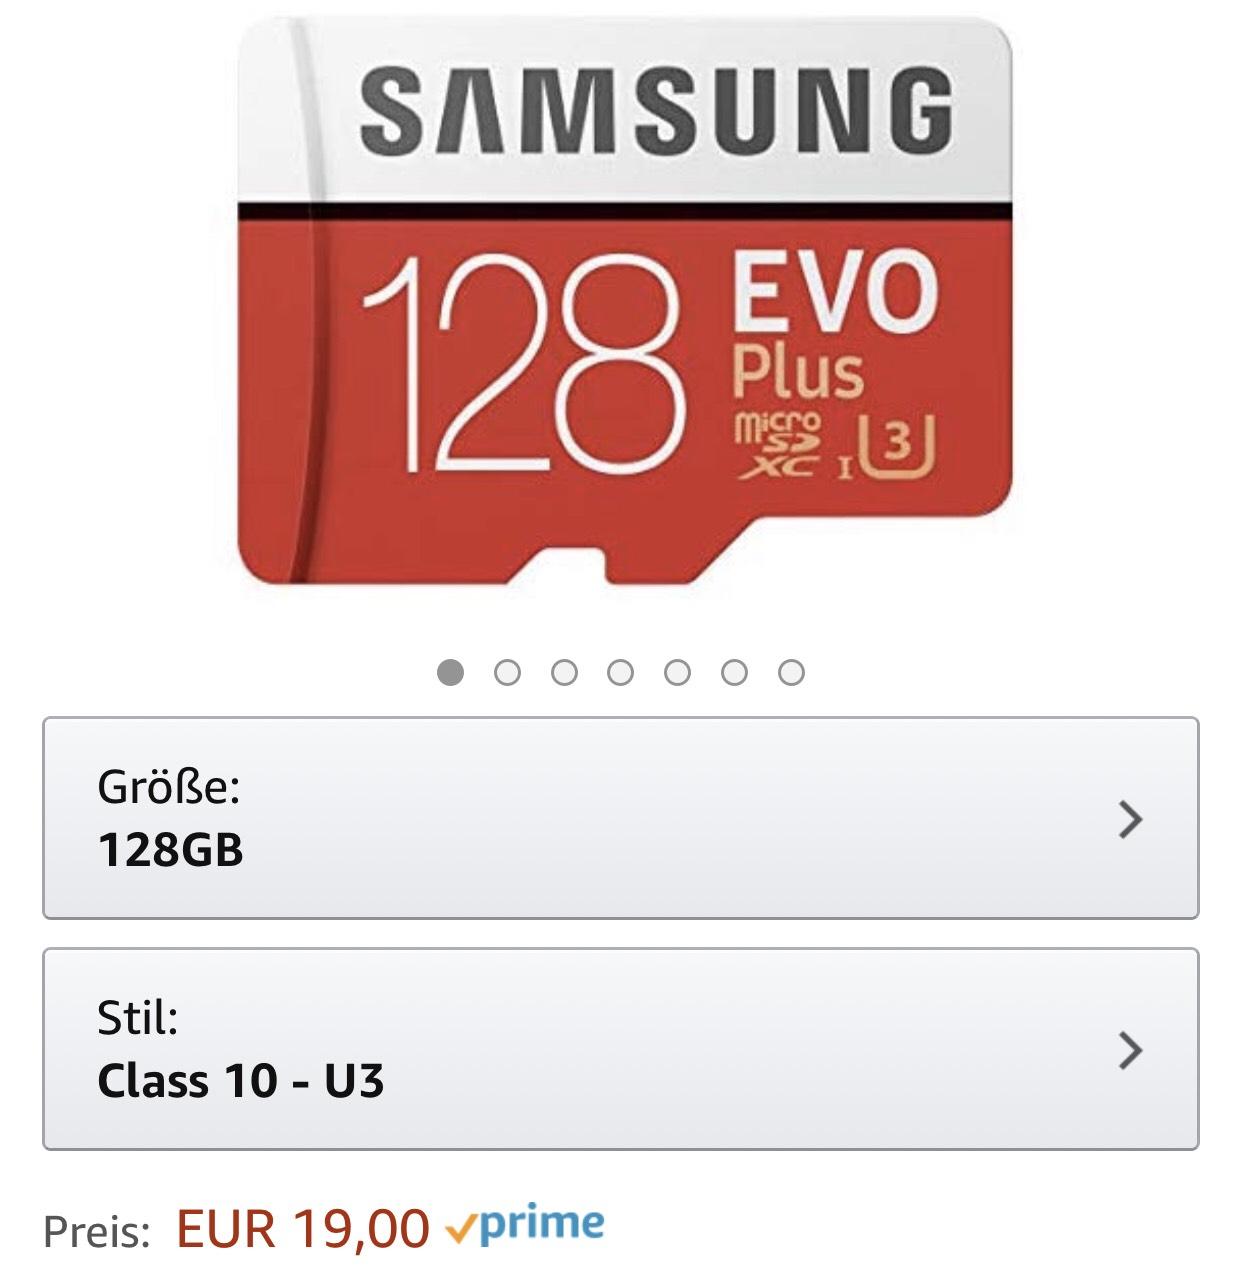 Samsung EVO plus 128gb klasse 10, u3 microsd